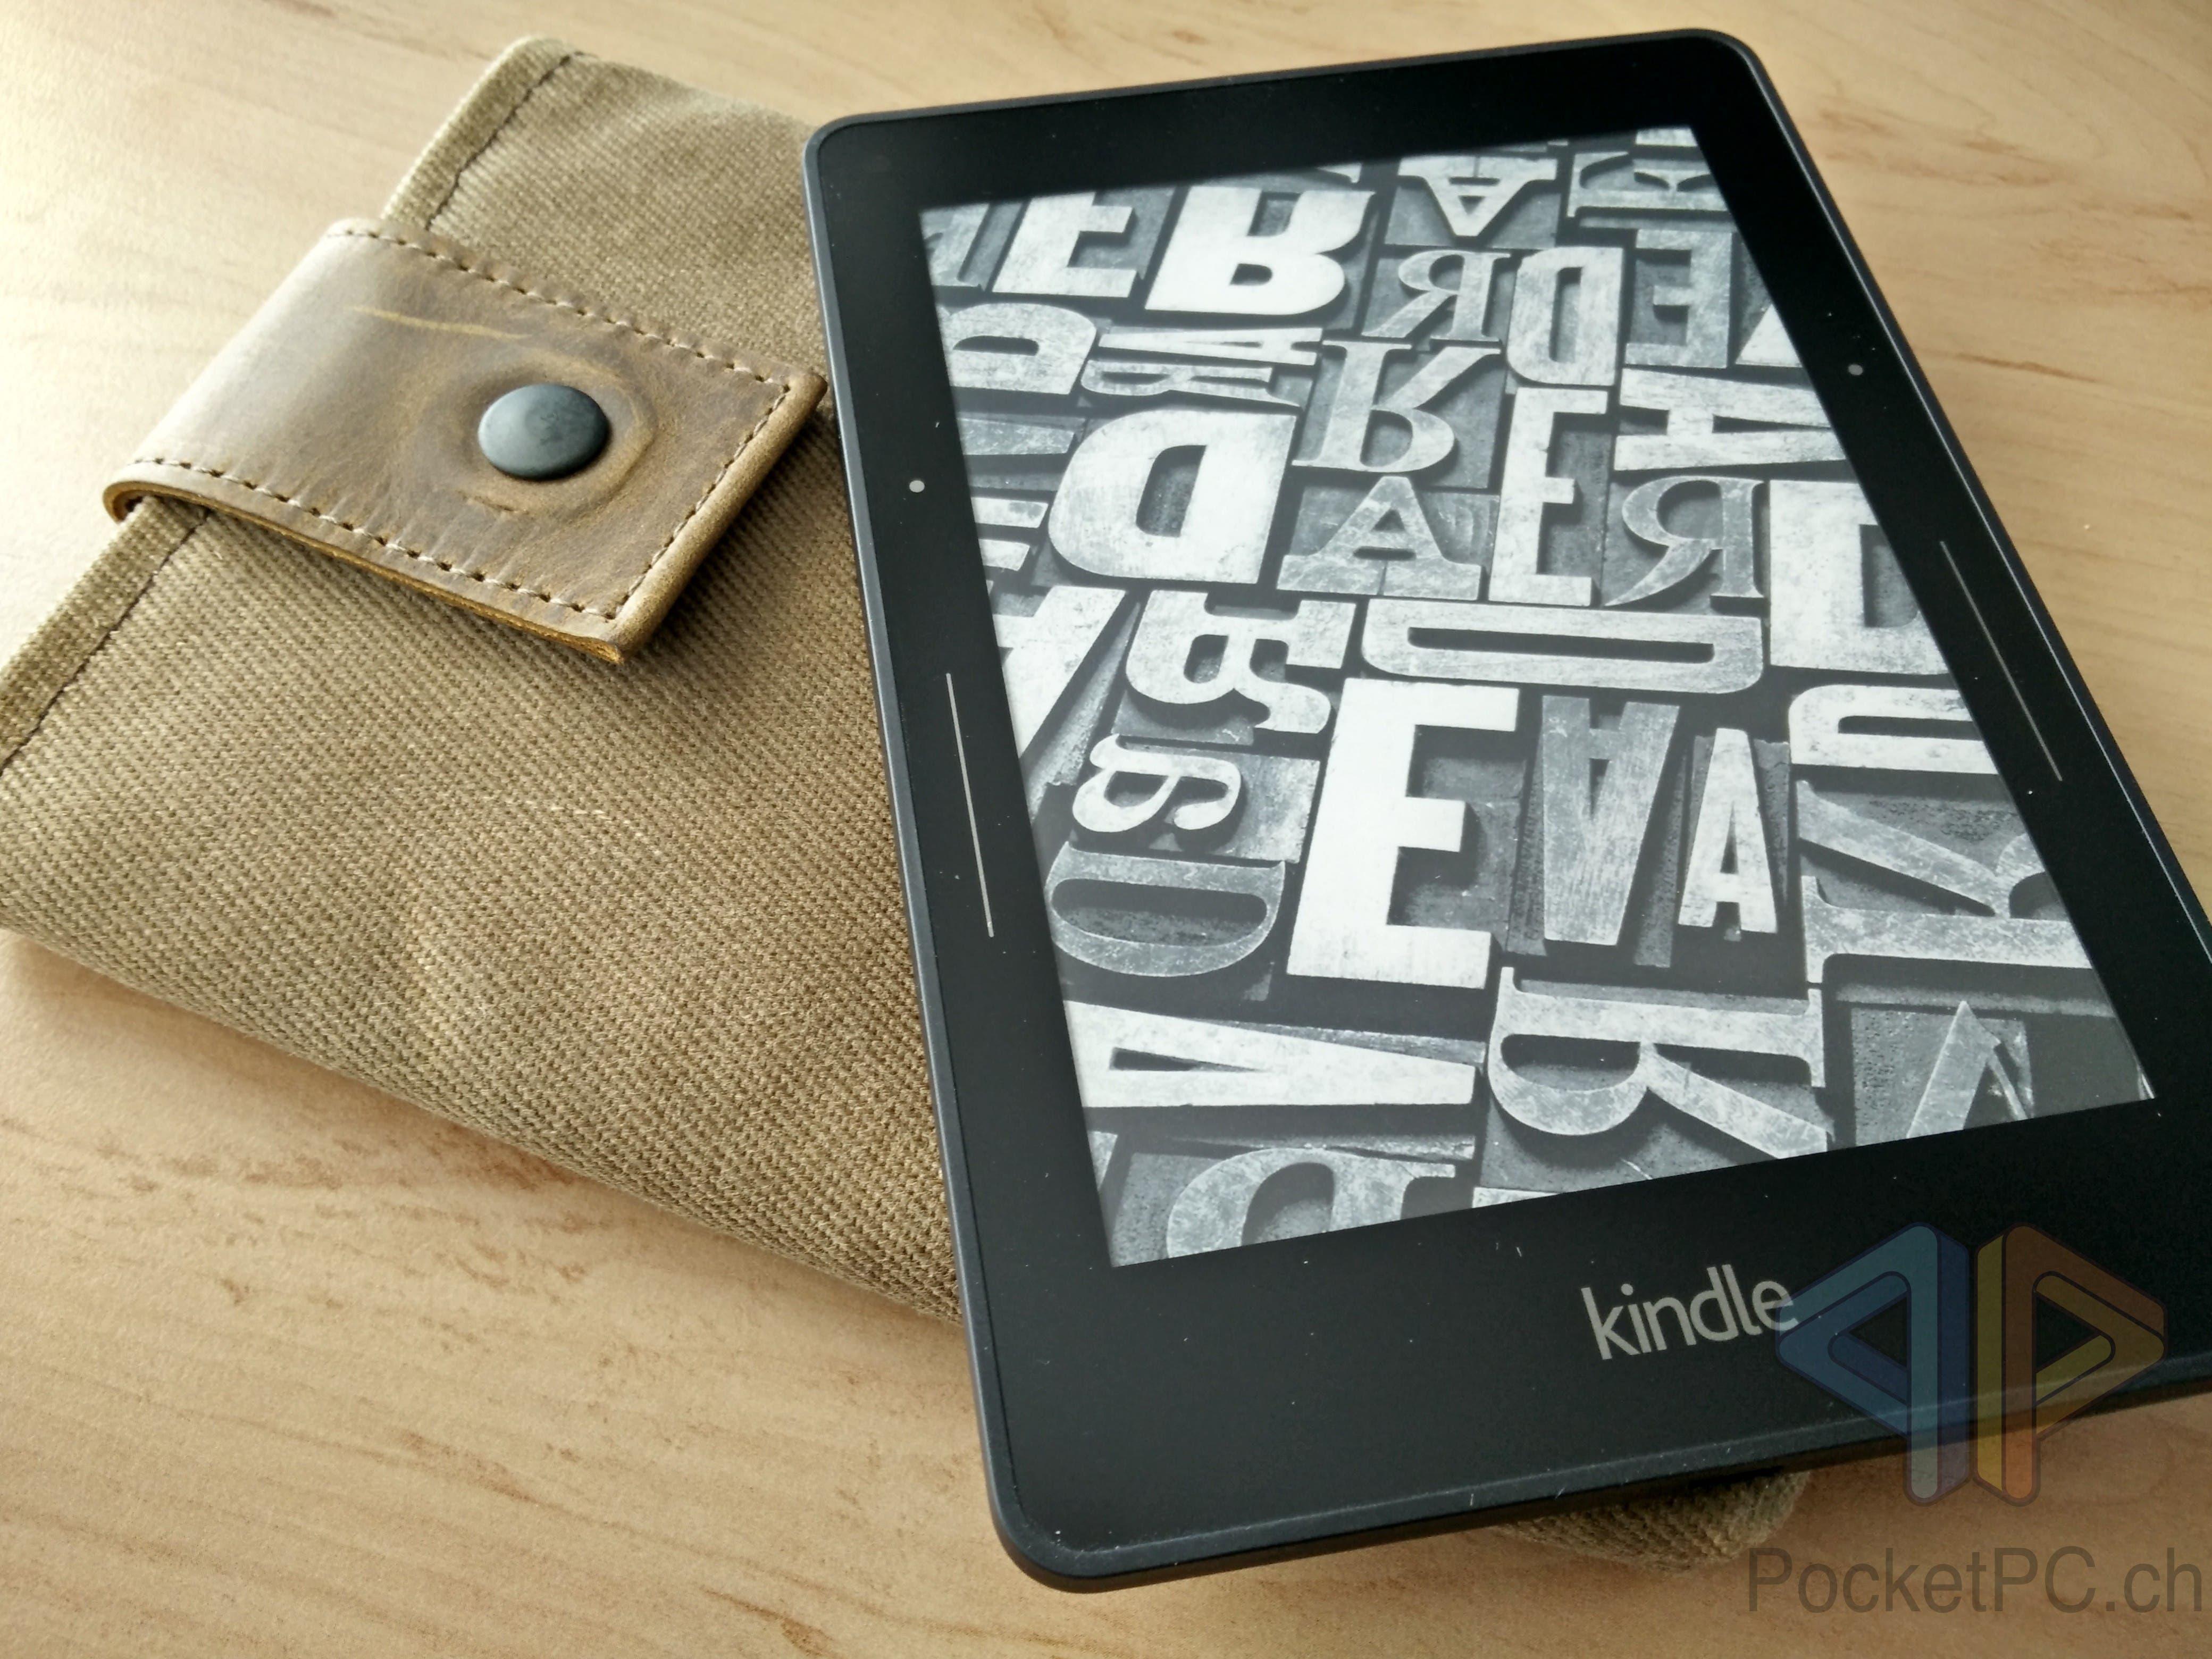 Review: Outback Slip Case für KindleVoyage im Test